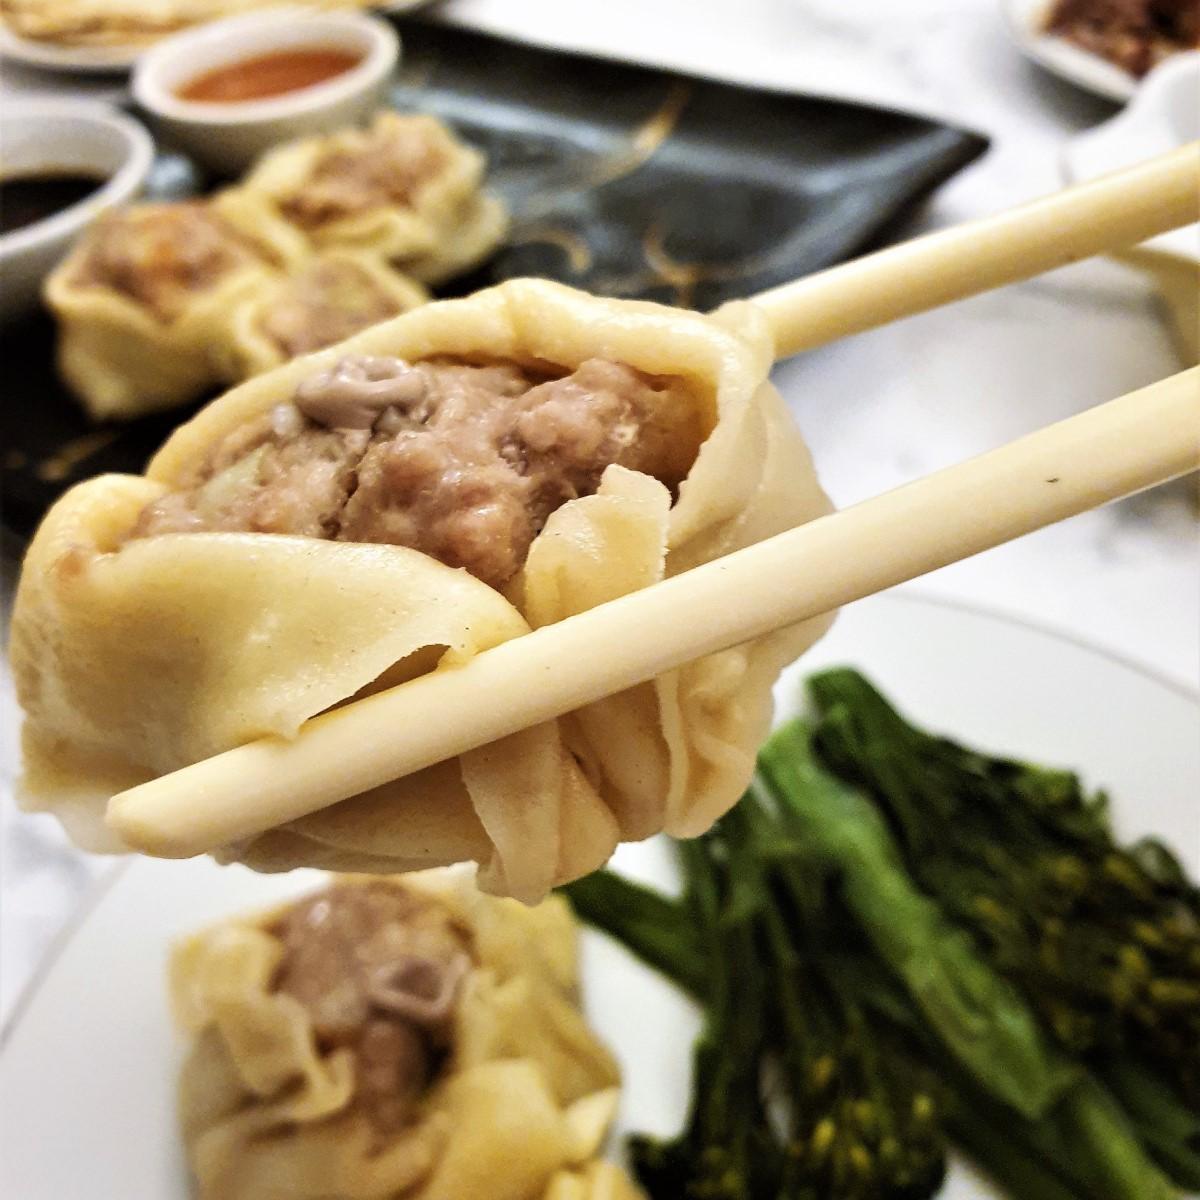 A pork and shrimp dumpling held in chopsticks.